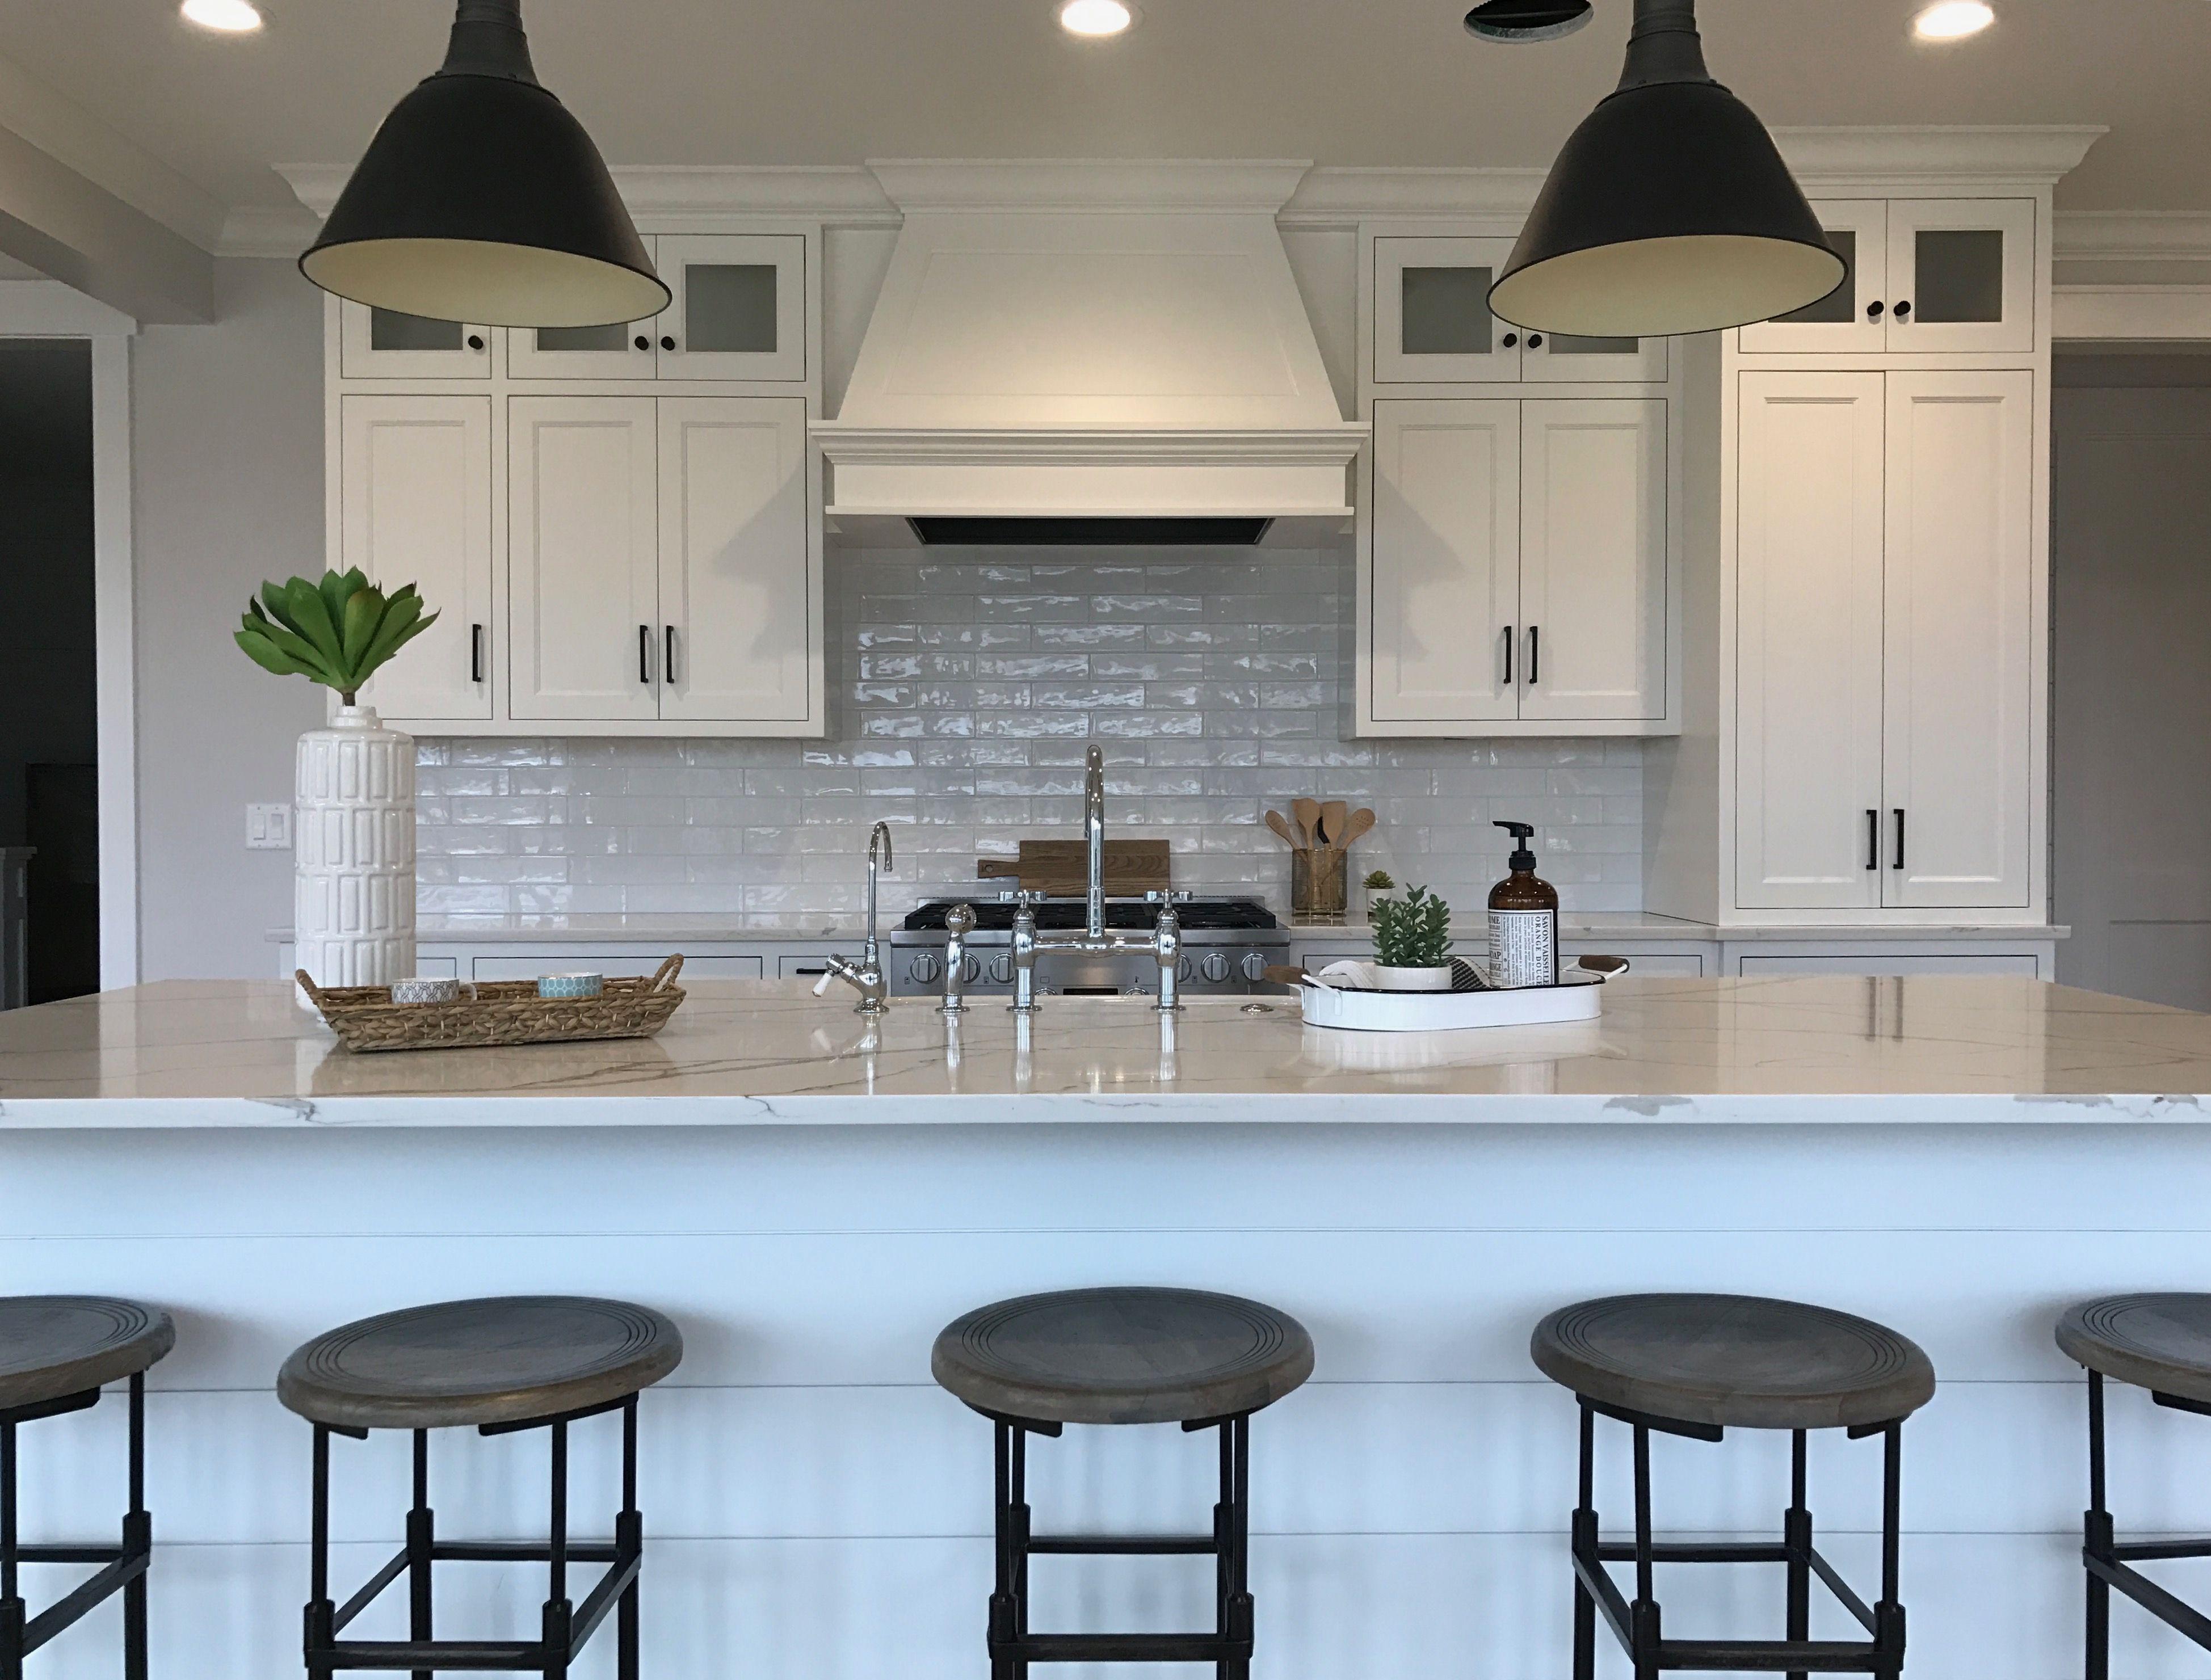 industrial farmhouse kitchen kitchen farmhouse decor. Black Bedroom Furniture Sets. Home Design Ideas